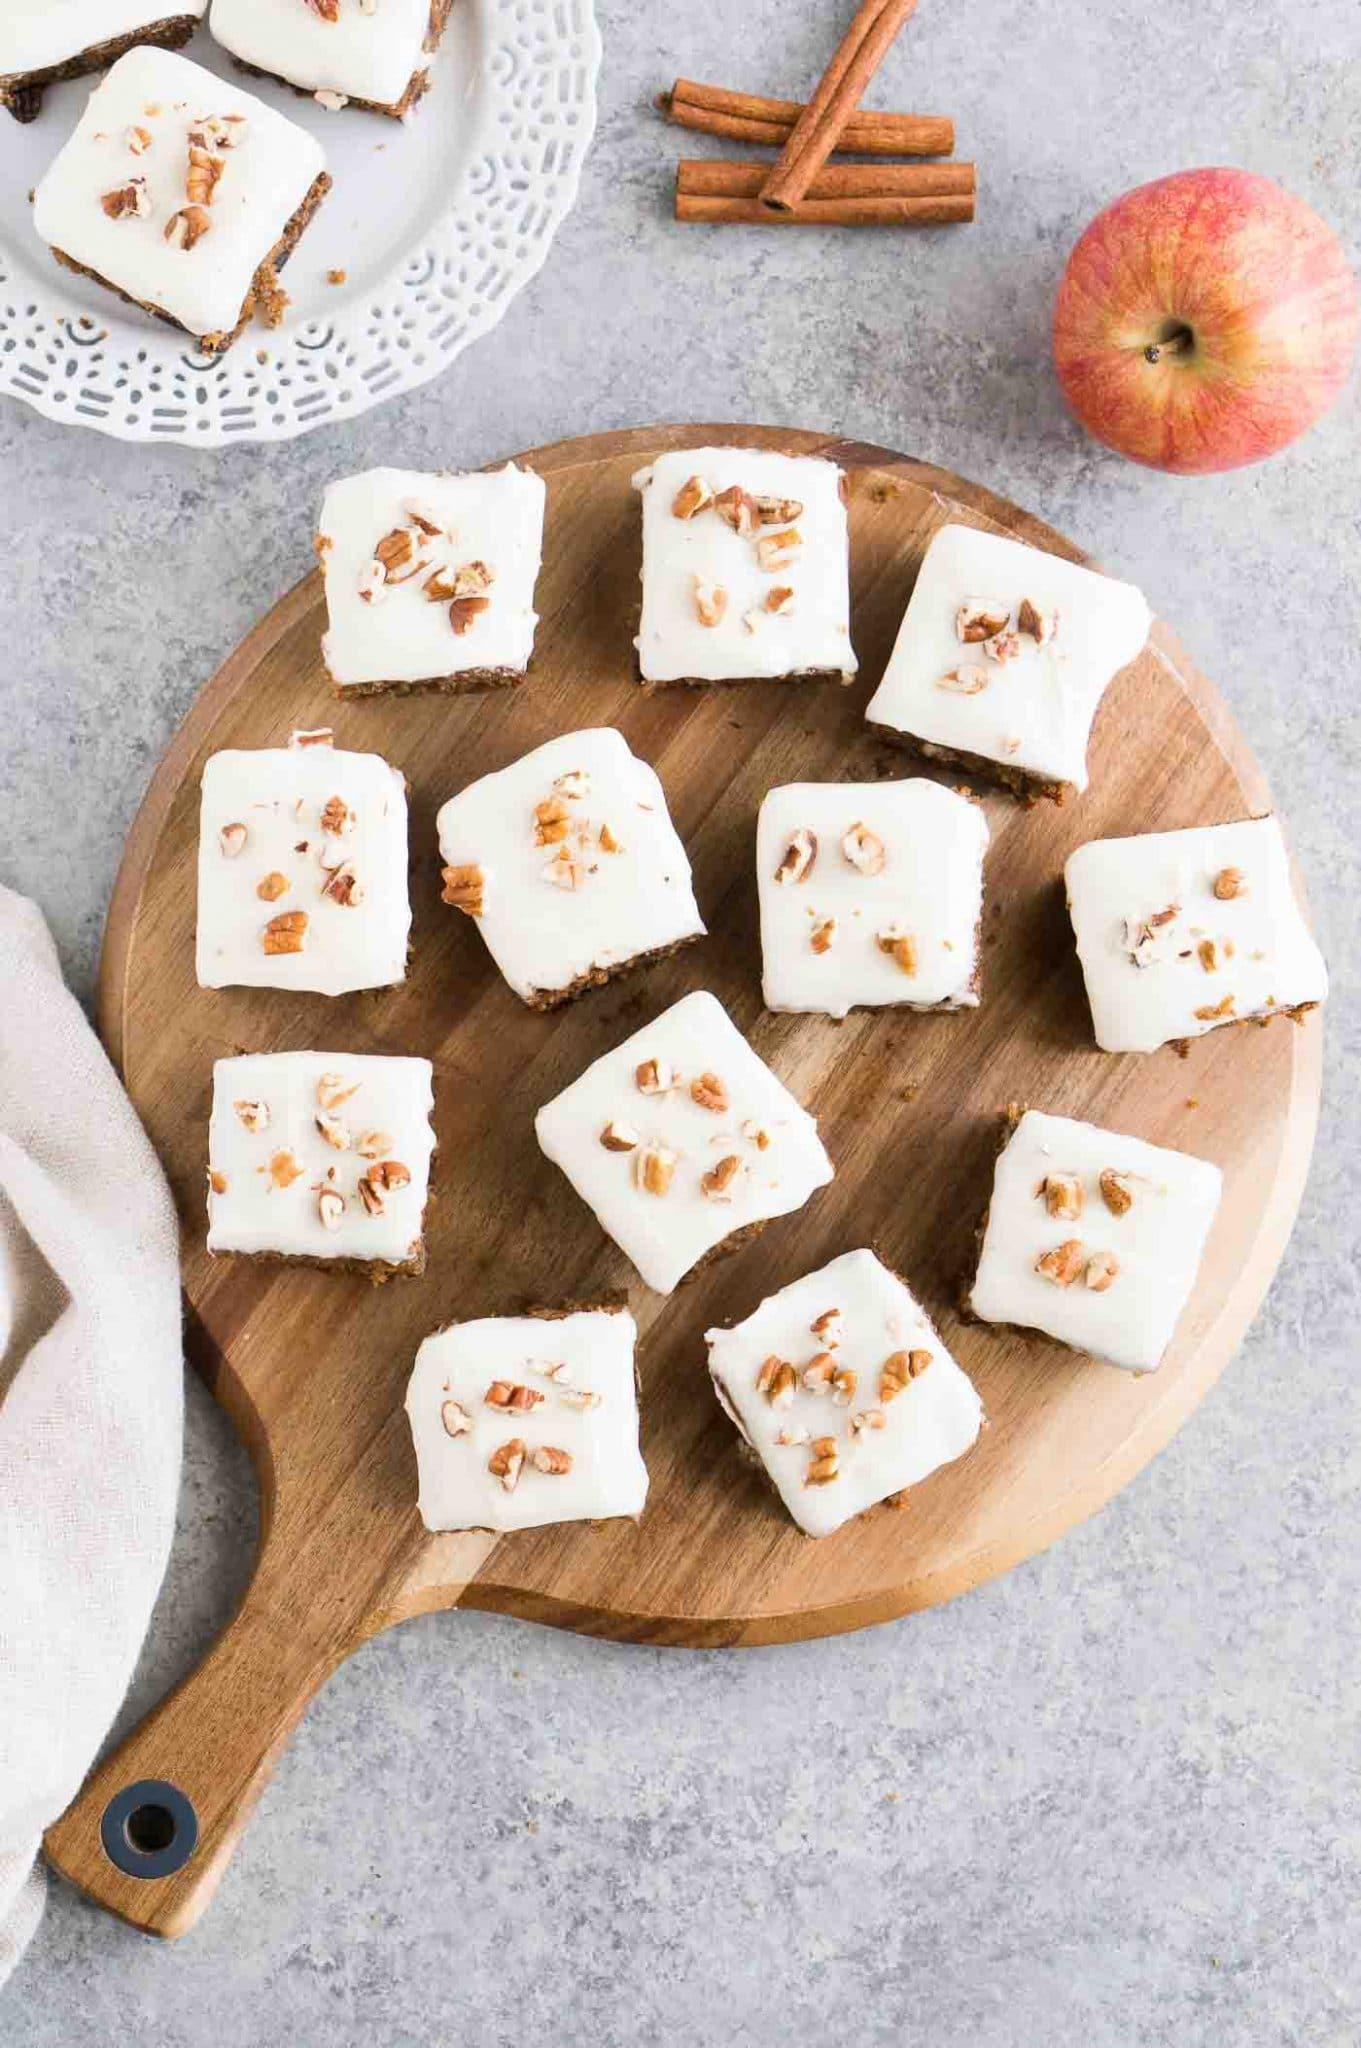 apple cake bars in a wooden board